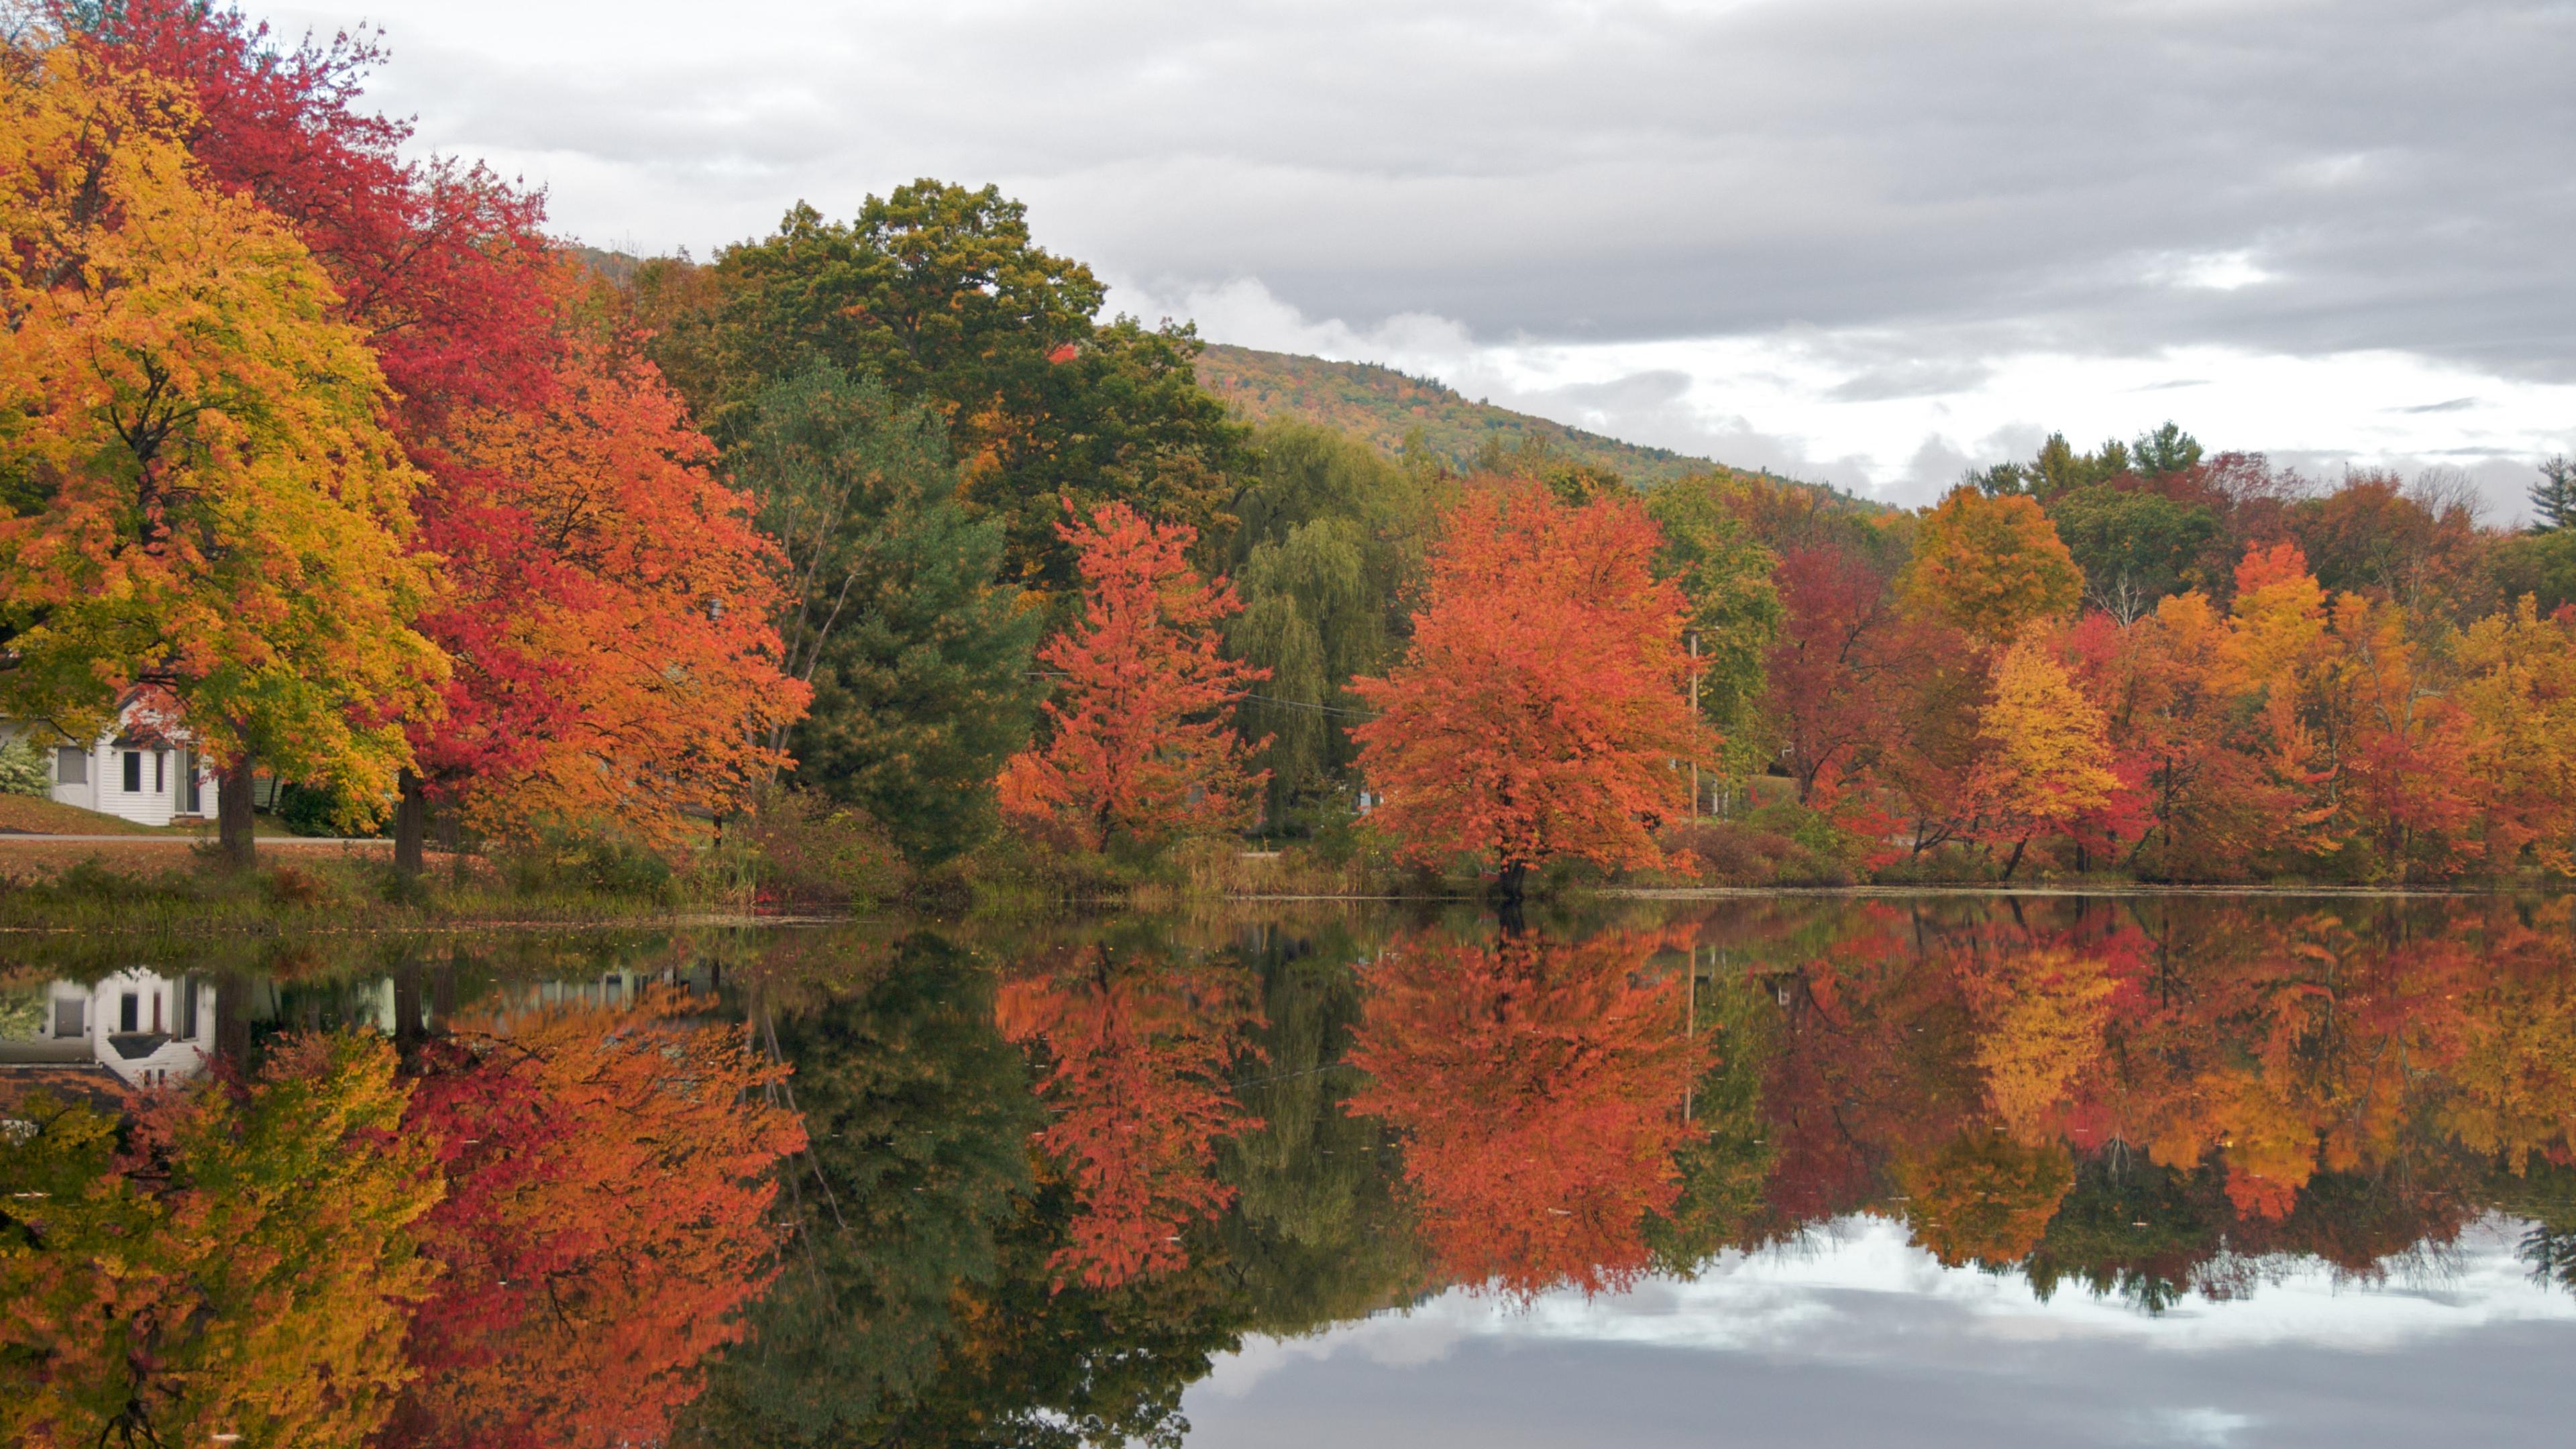 New England Fall - HD Wallpaper